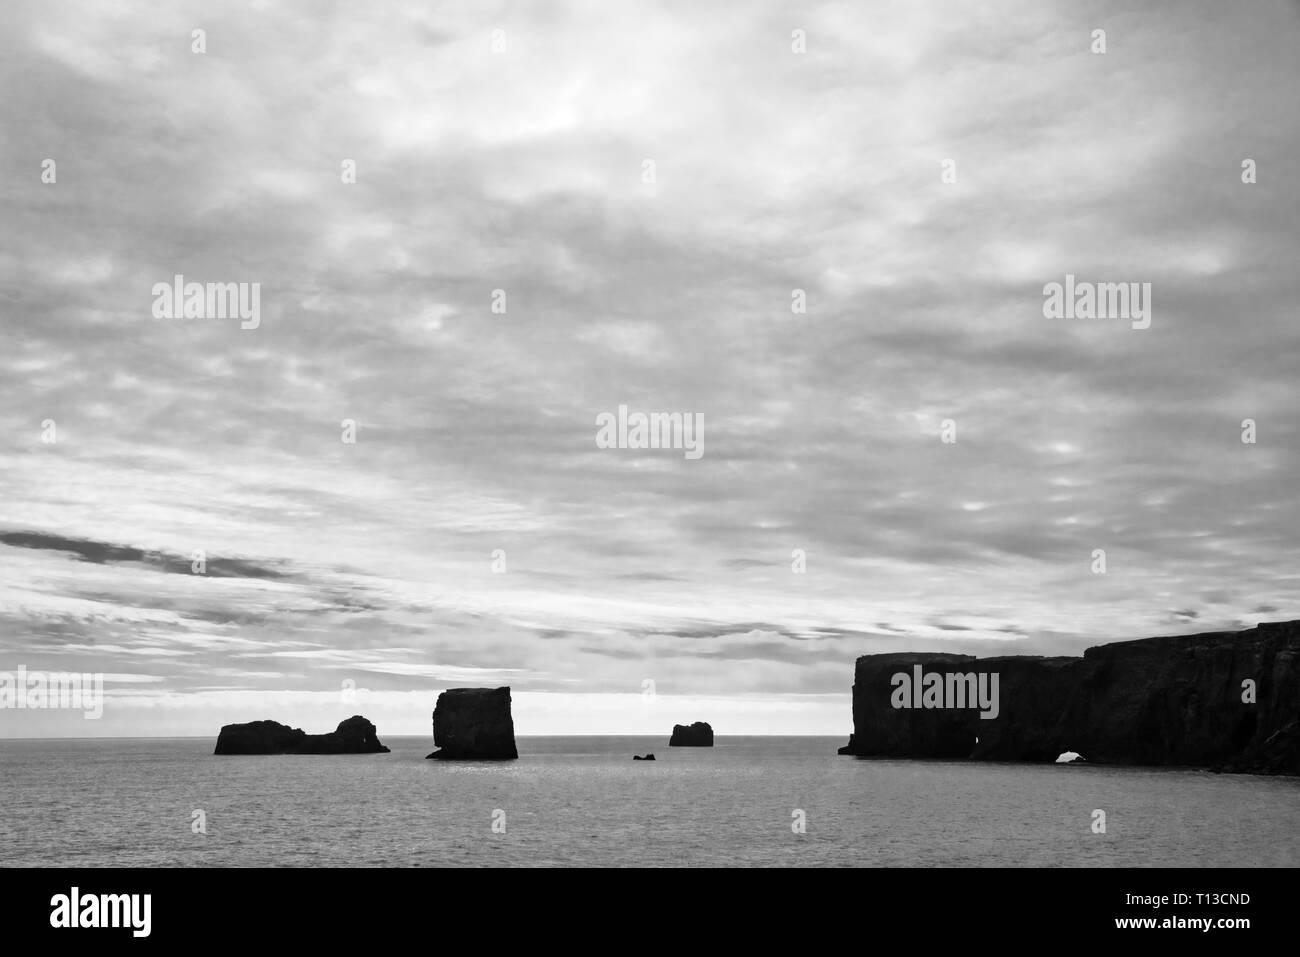 Rock arch at Dyrholaey, Vik, Iceland - Stock Image